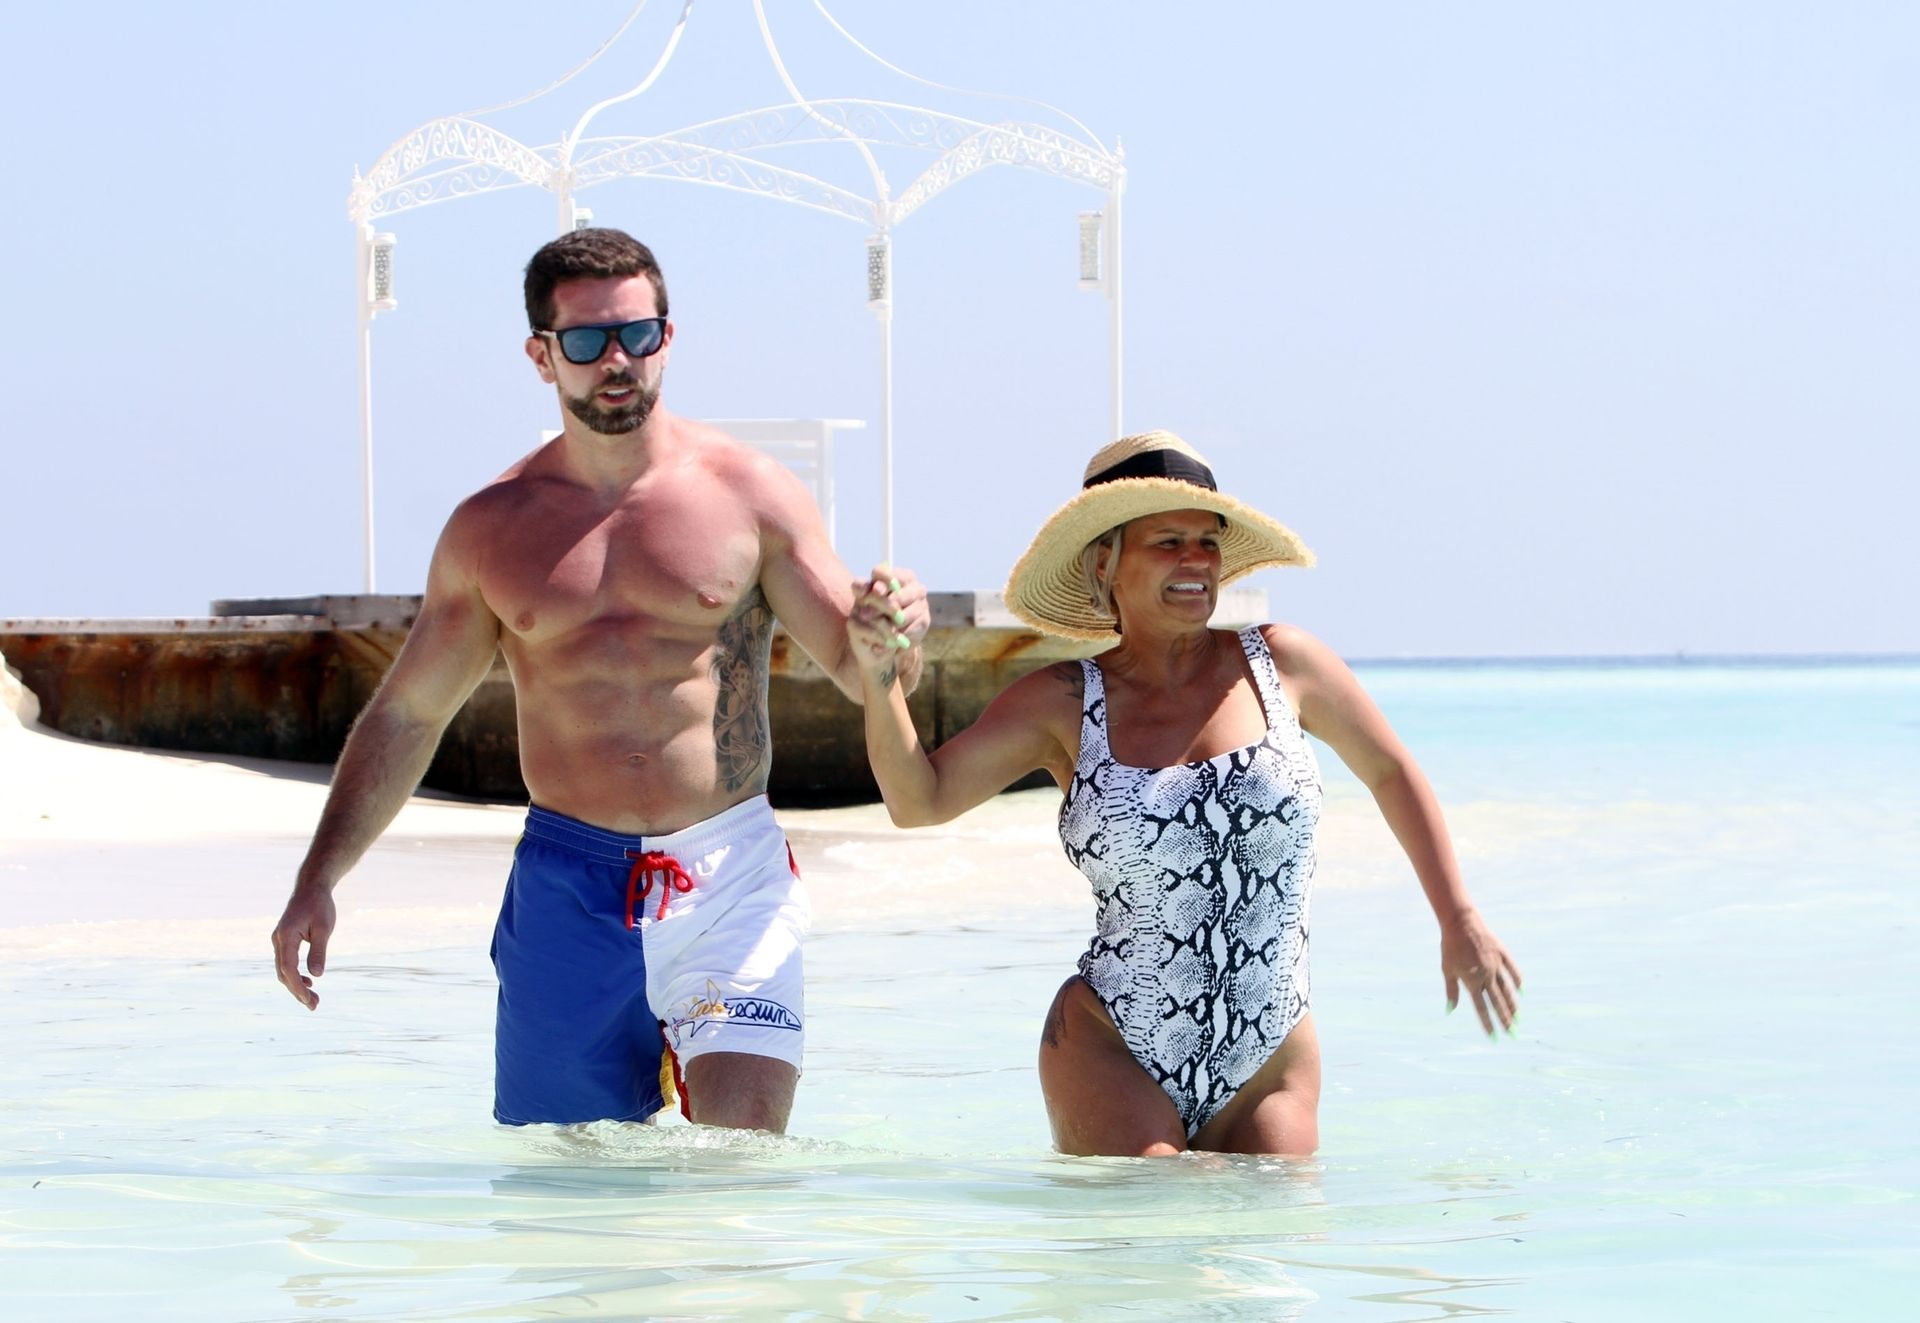 Kerry Katona & Ryan Mahoney Hit The Beach On Holiday At Their Luxury 5 Star Resort Ayada Maldives 0026